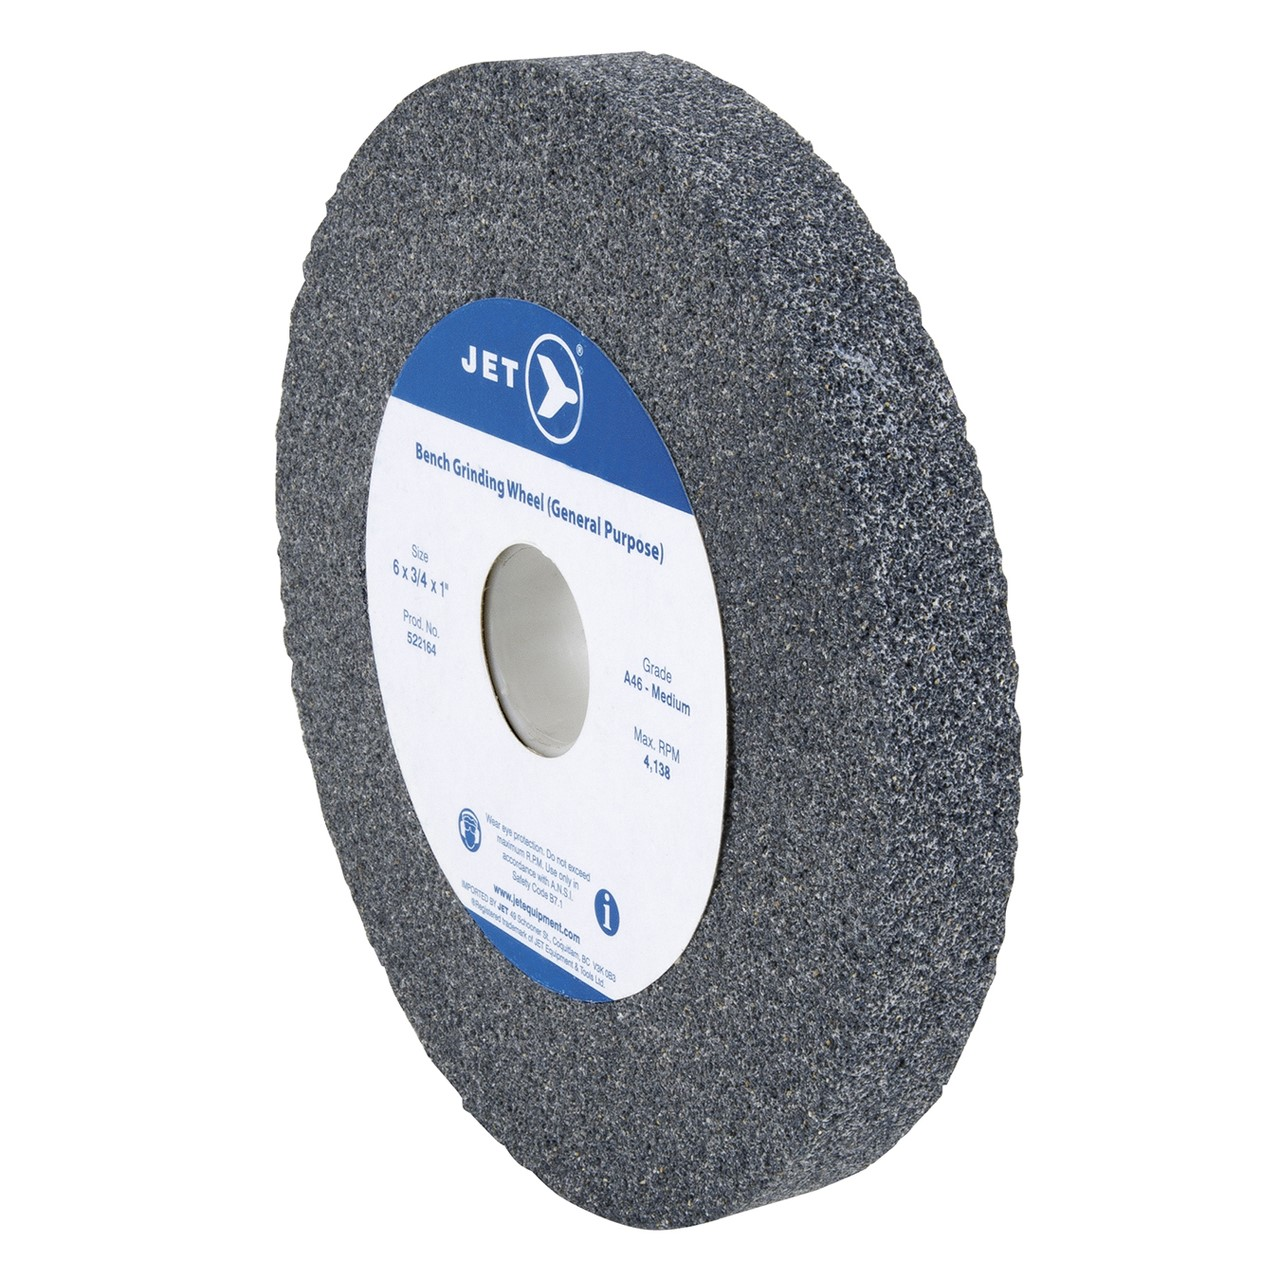 6 X 1 X 1 A80 Bench Grinding Wheel Jt522176 Sabre